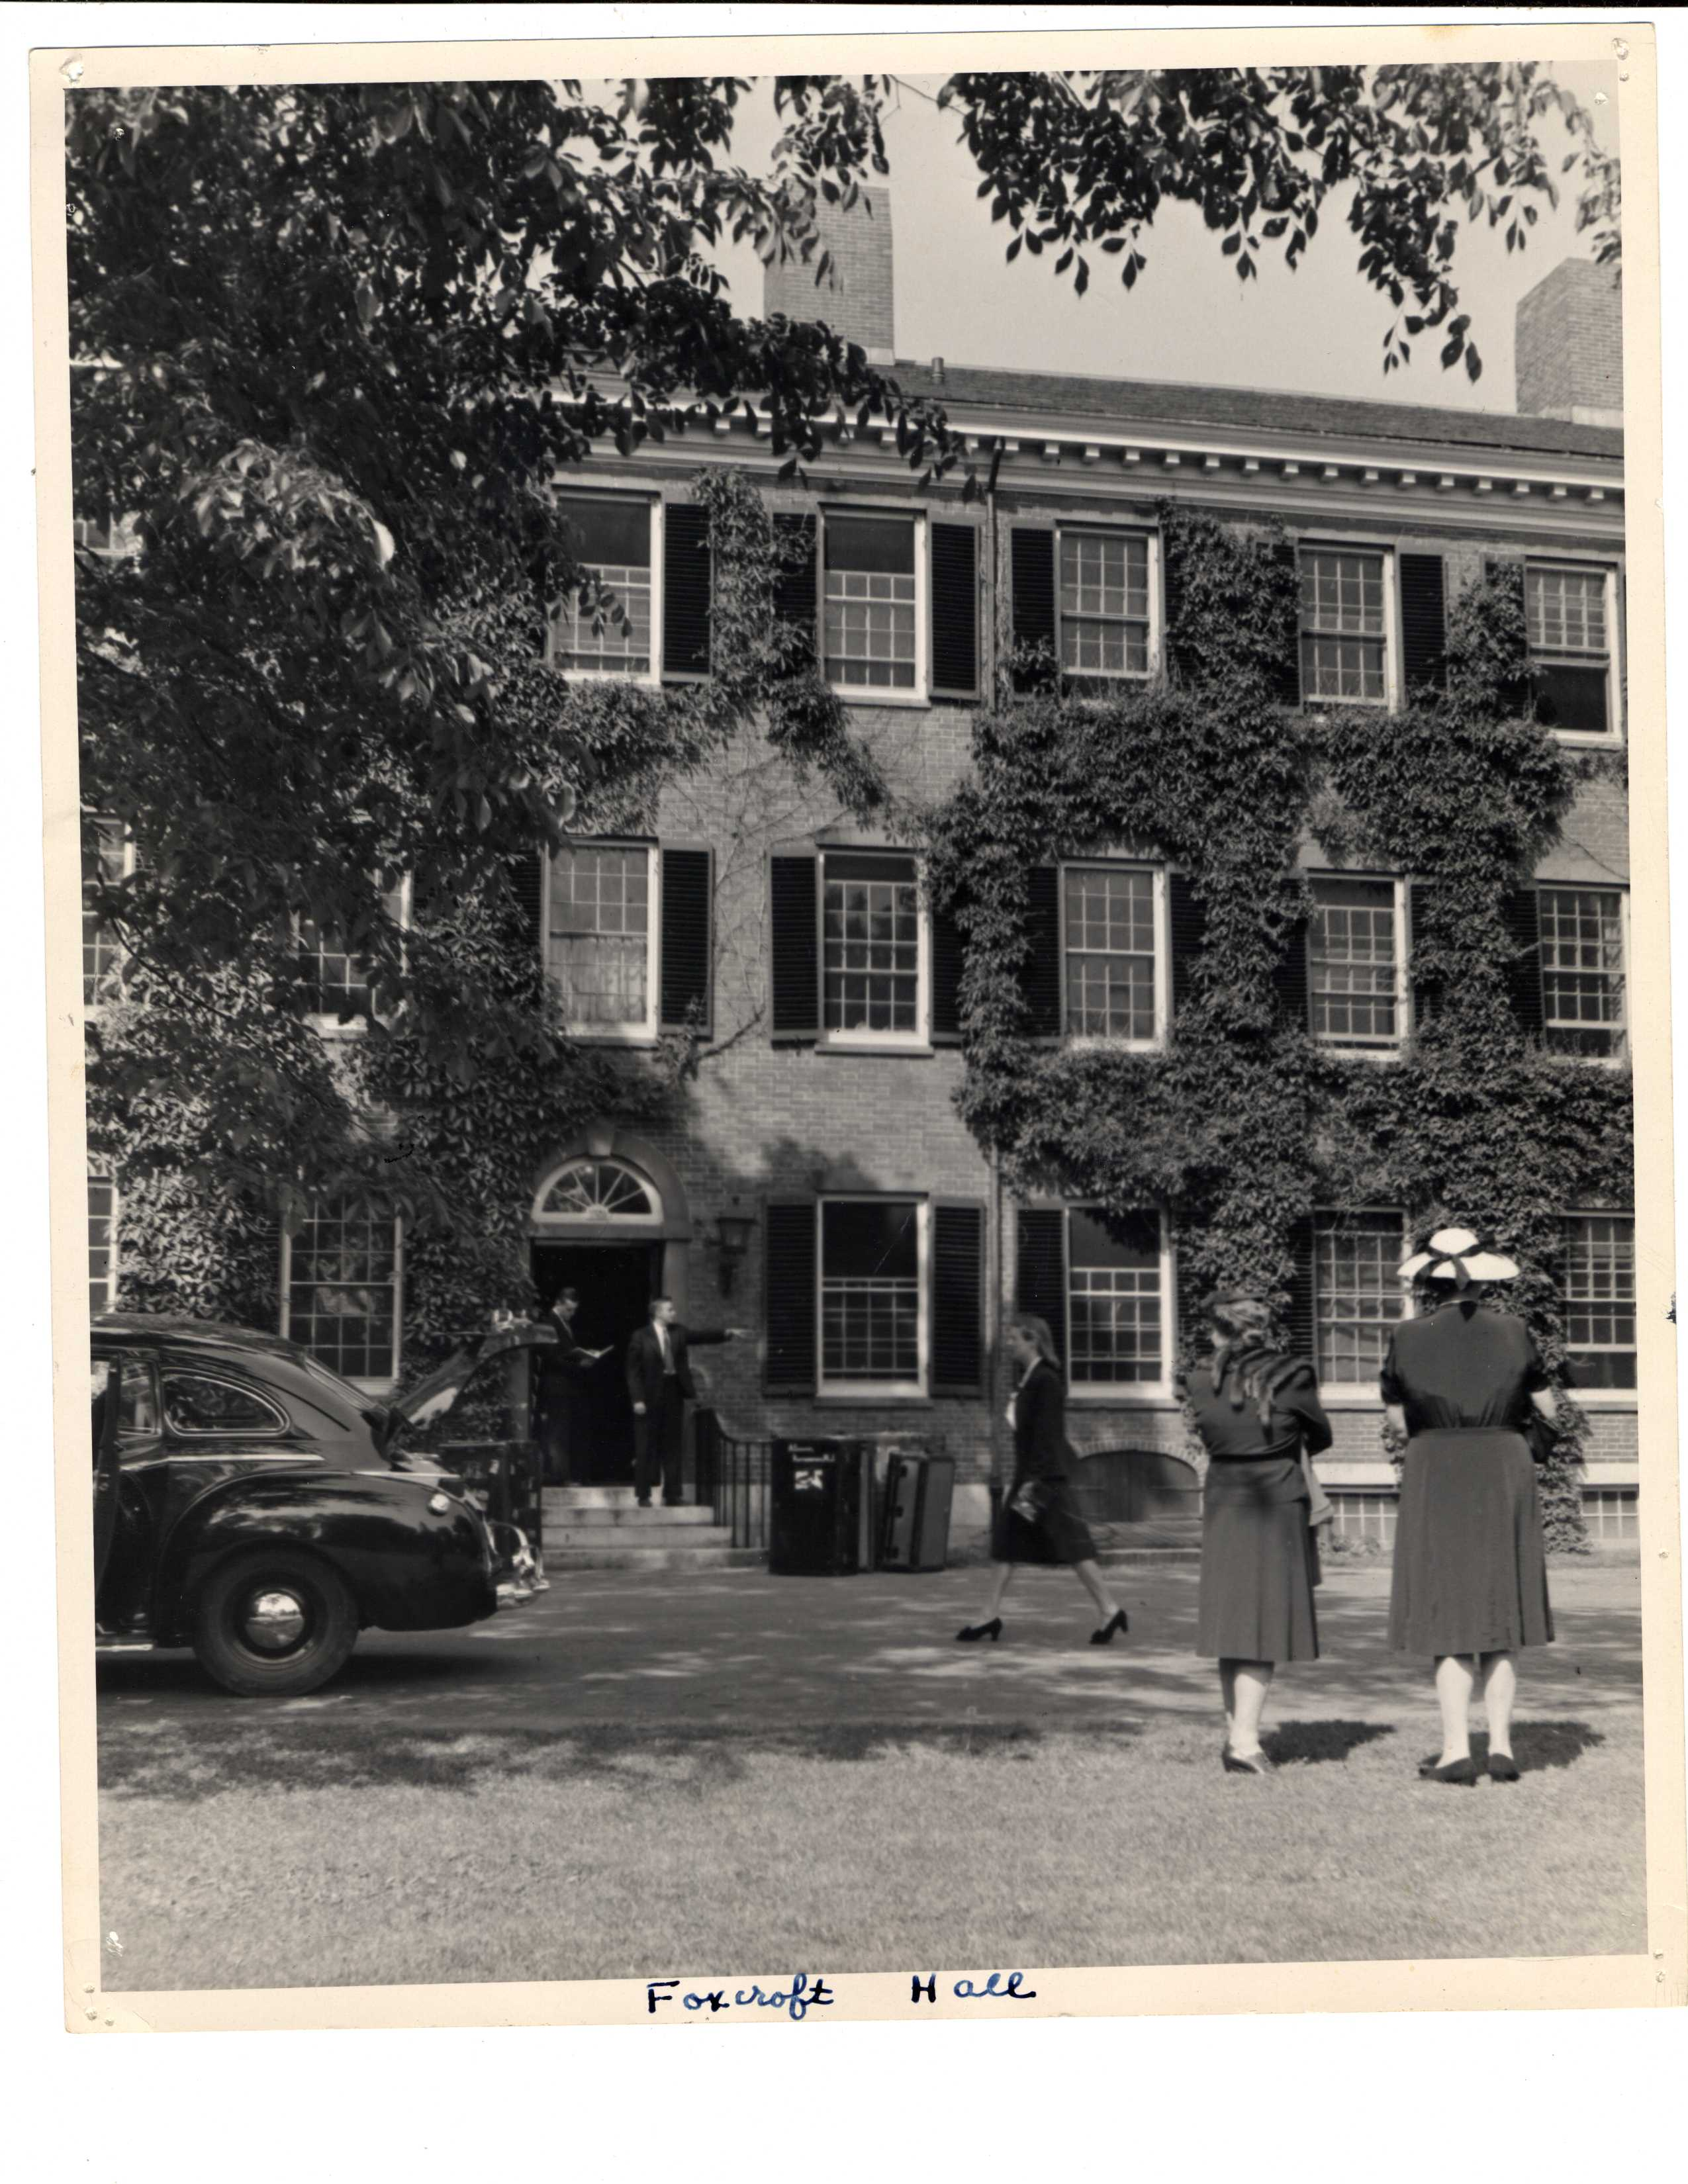 Foxcroft Hall